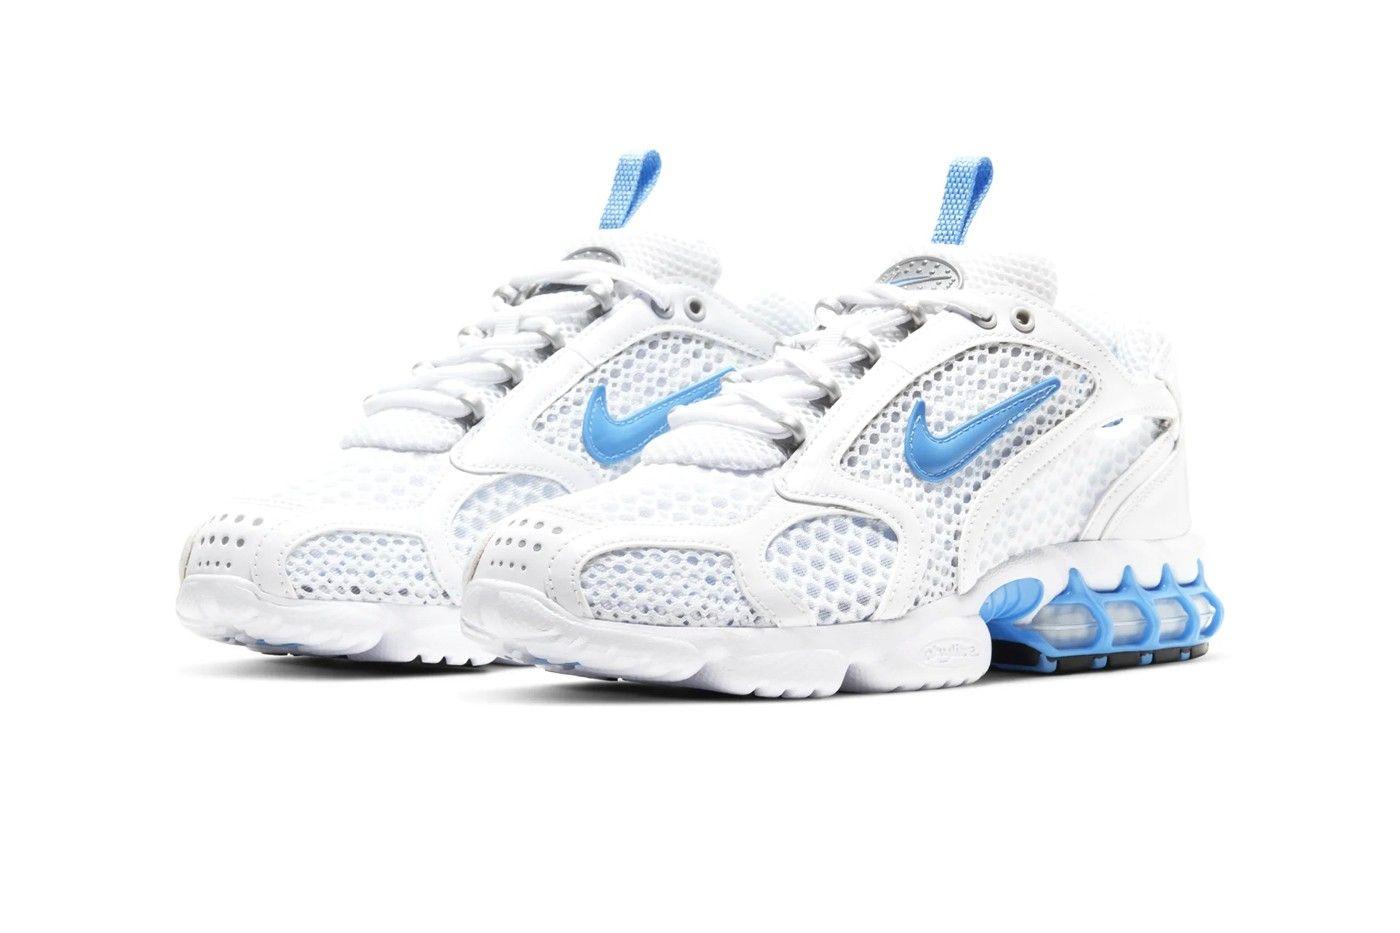 Nike Air Zoom Spiridon Cage 2